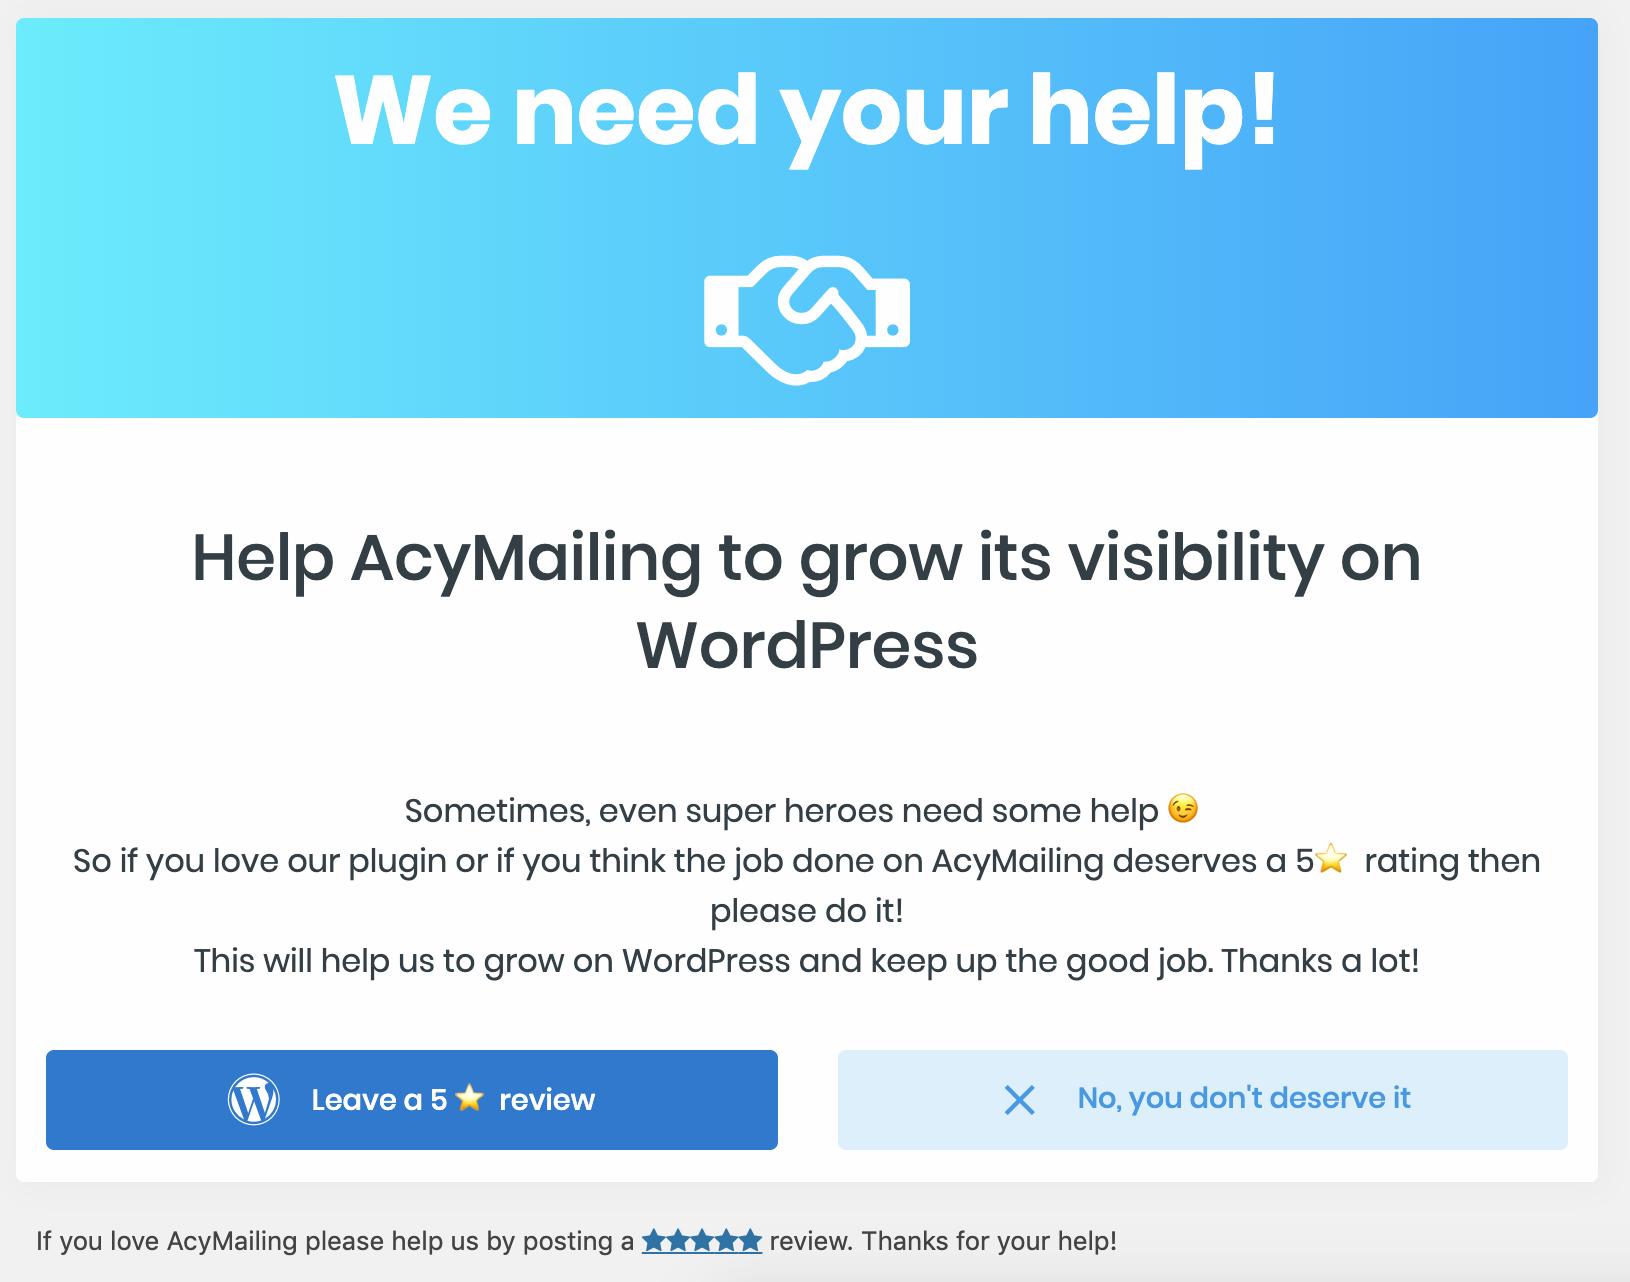 We need your help screenshot